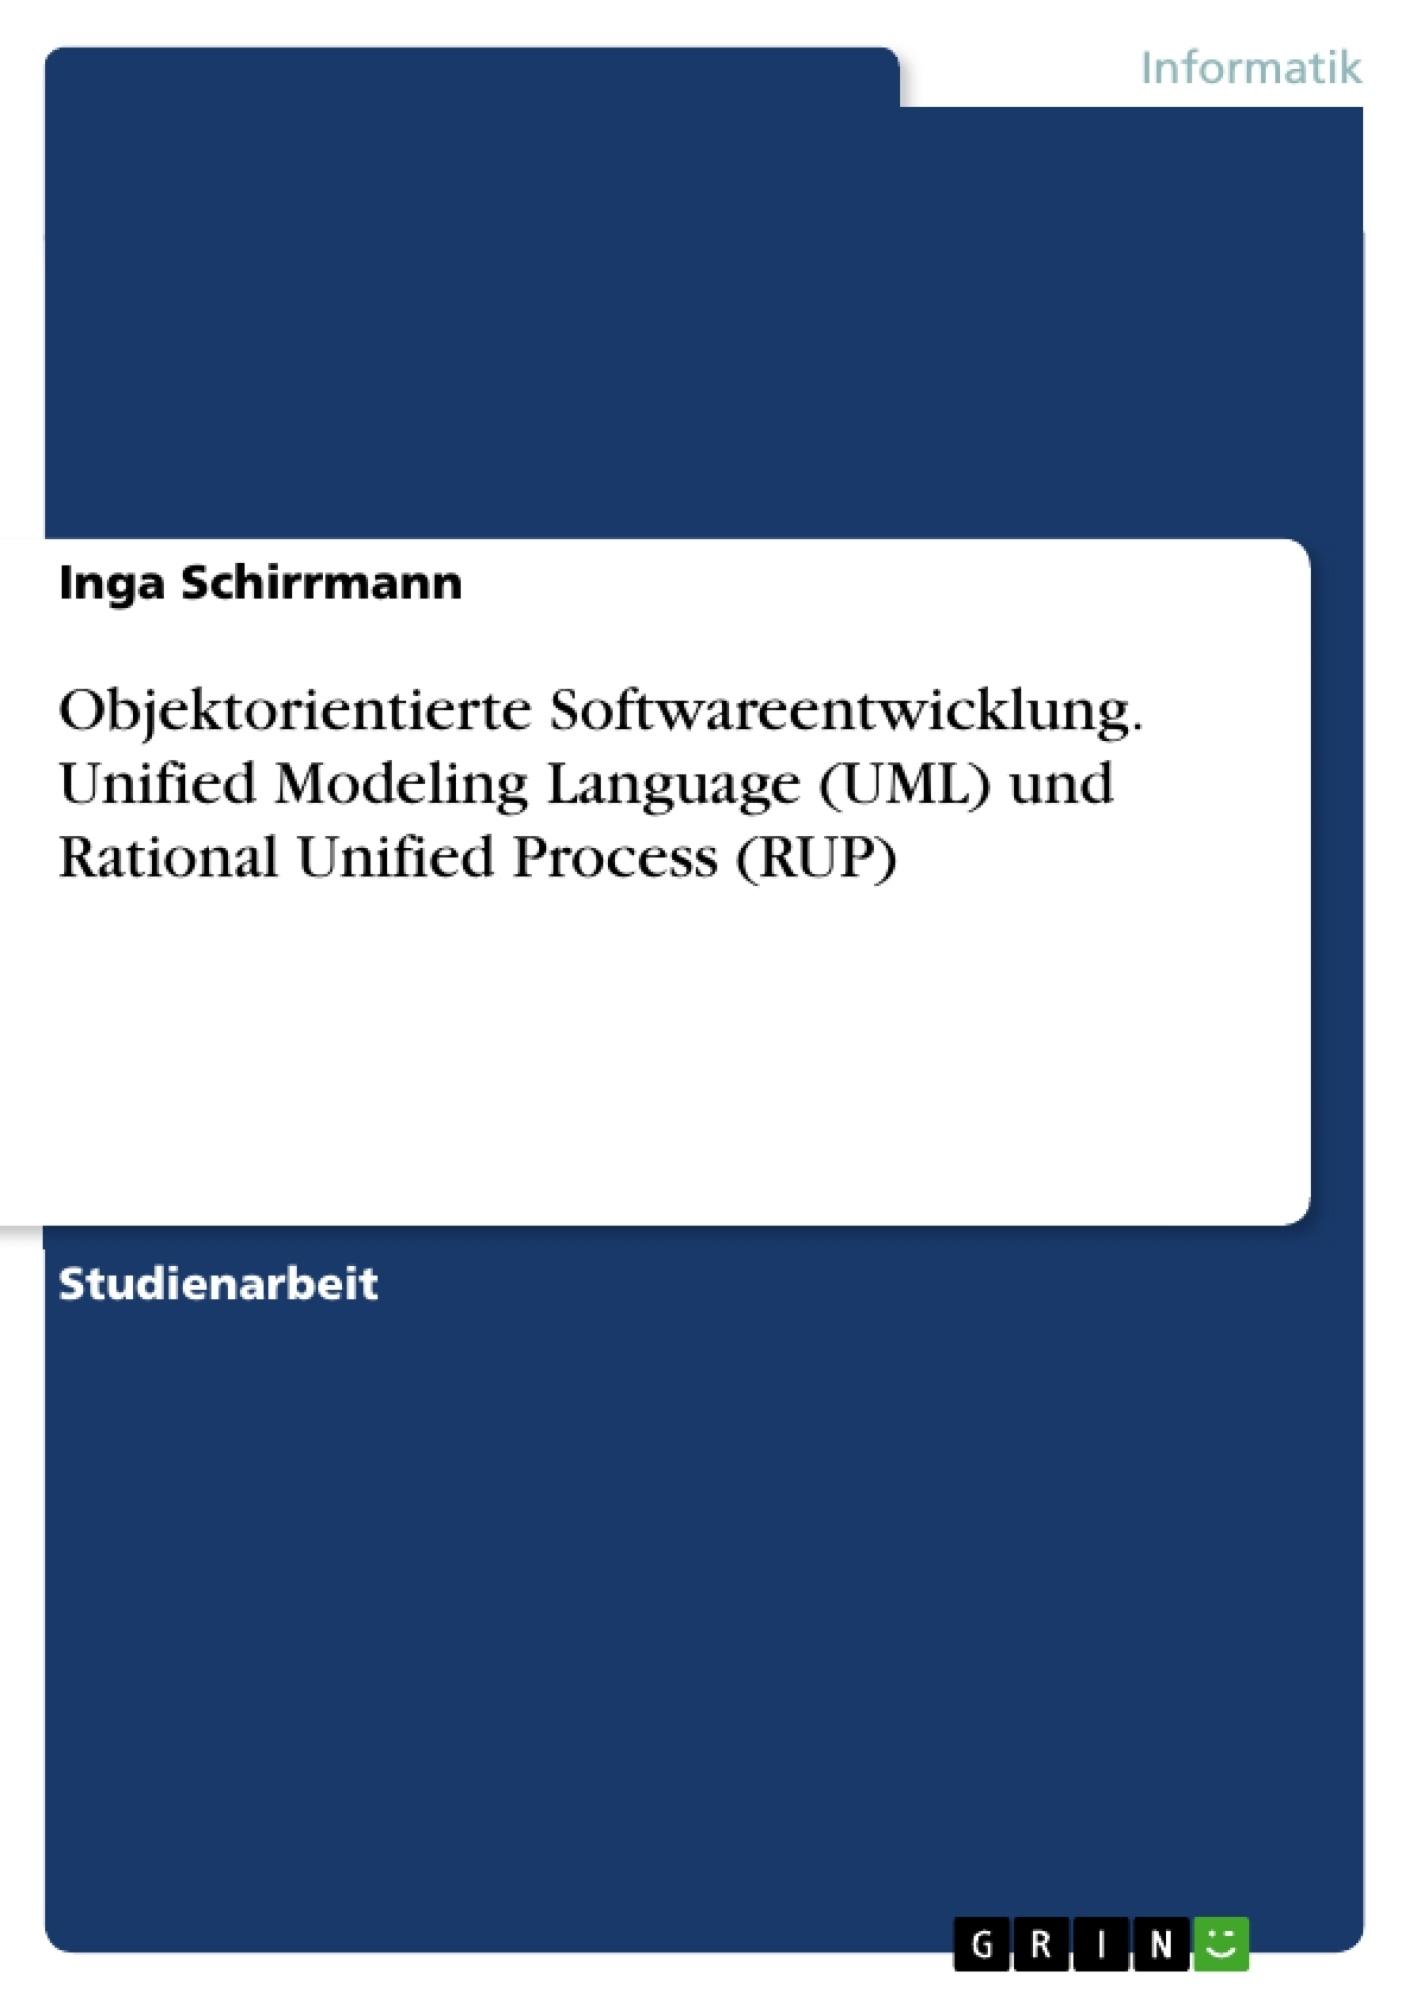 Titel: Objektorientierte Softwareentwicklung. Unified Modeling Language (UML) und Rational Unified Process (RUP)